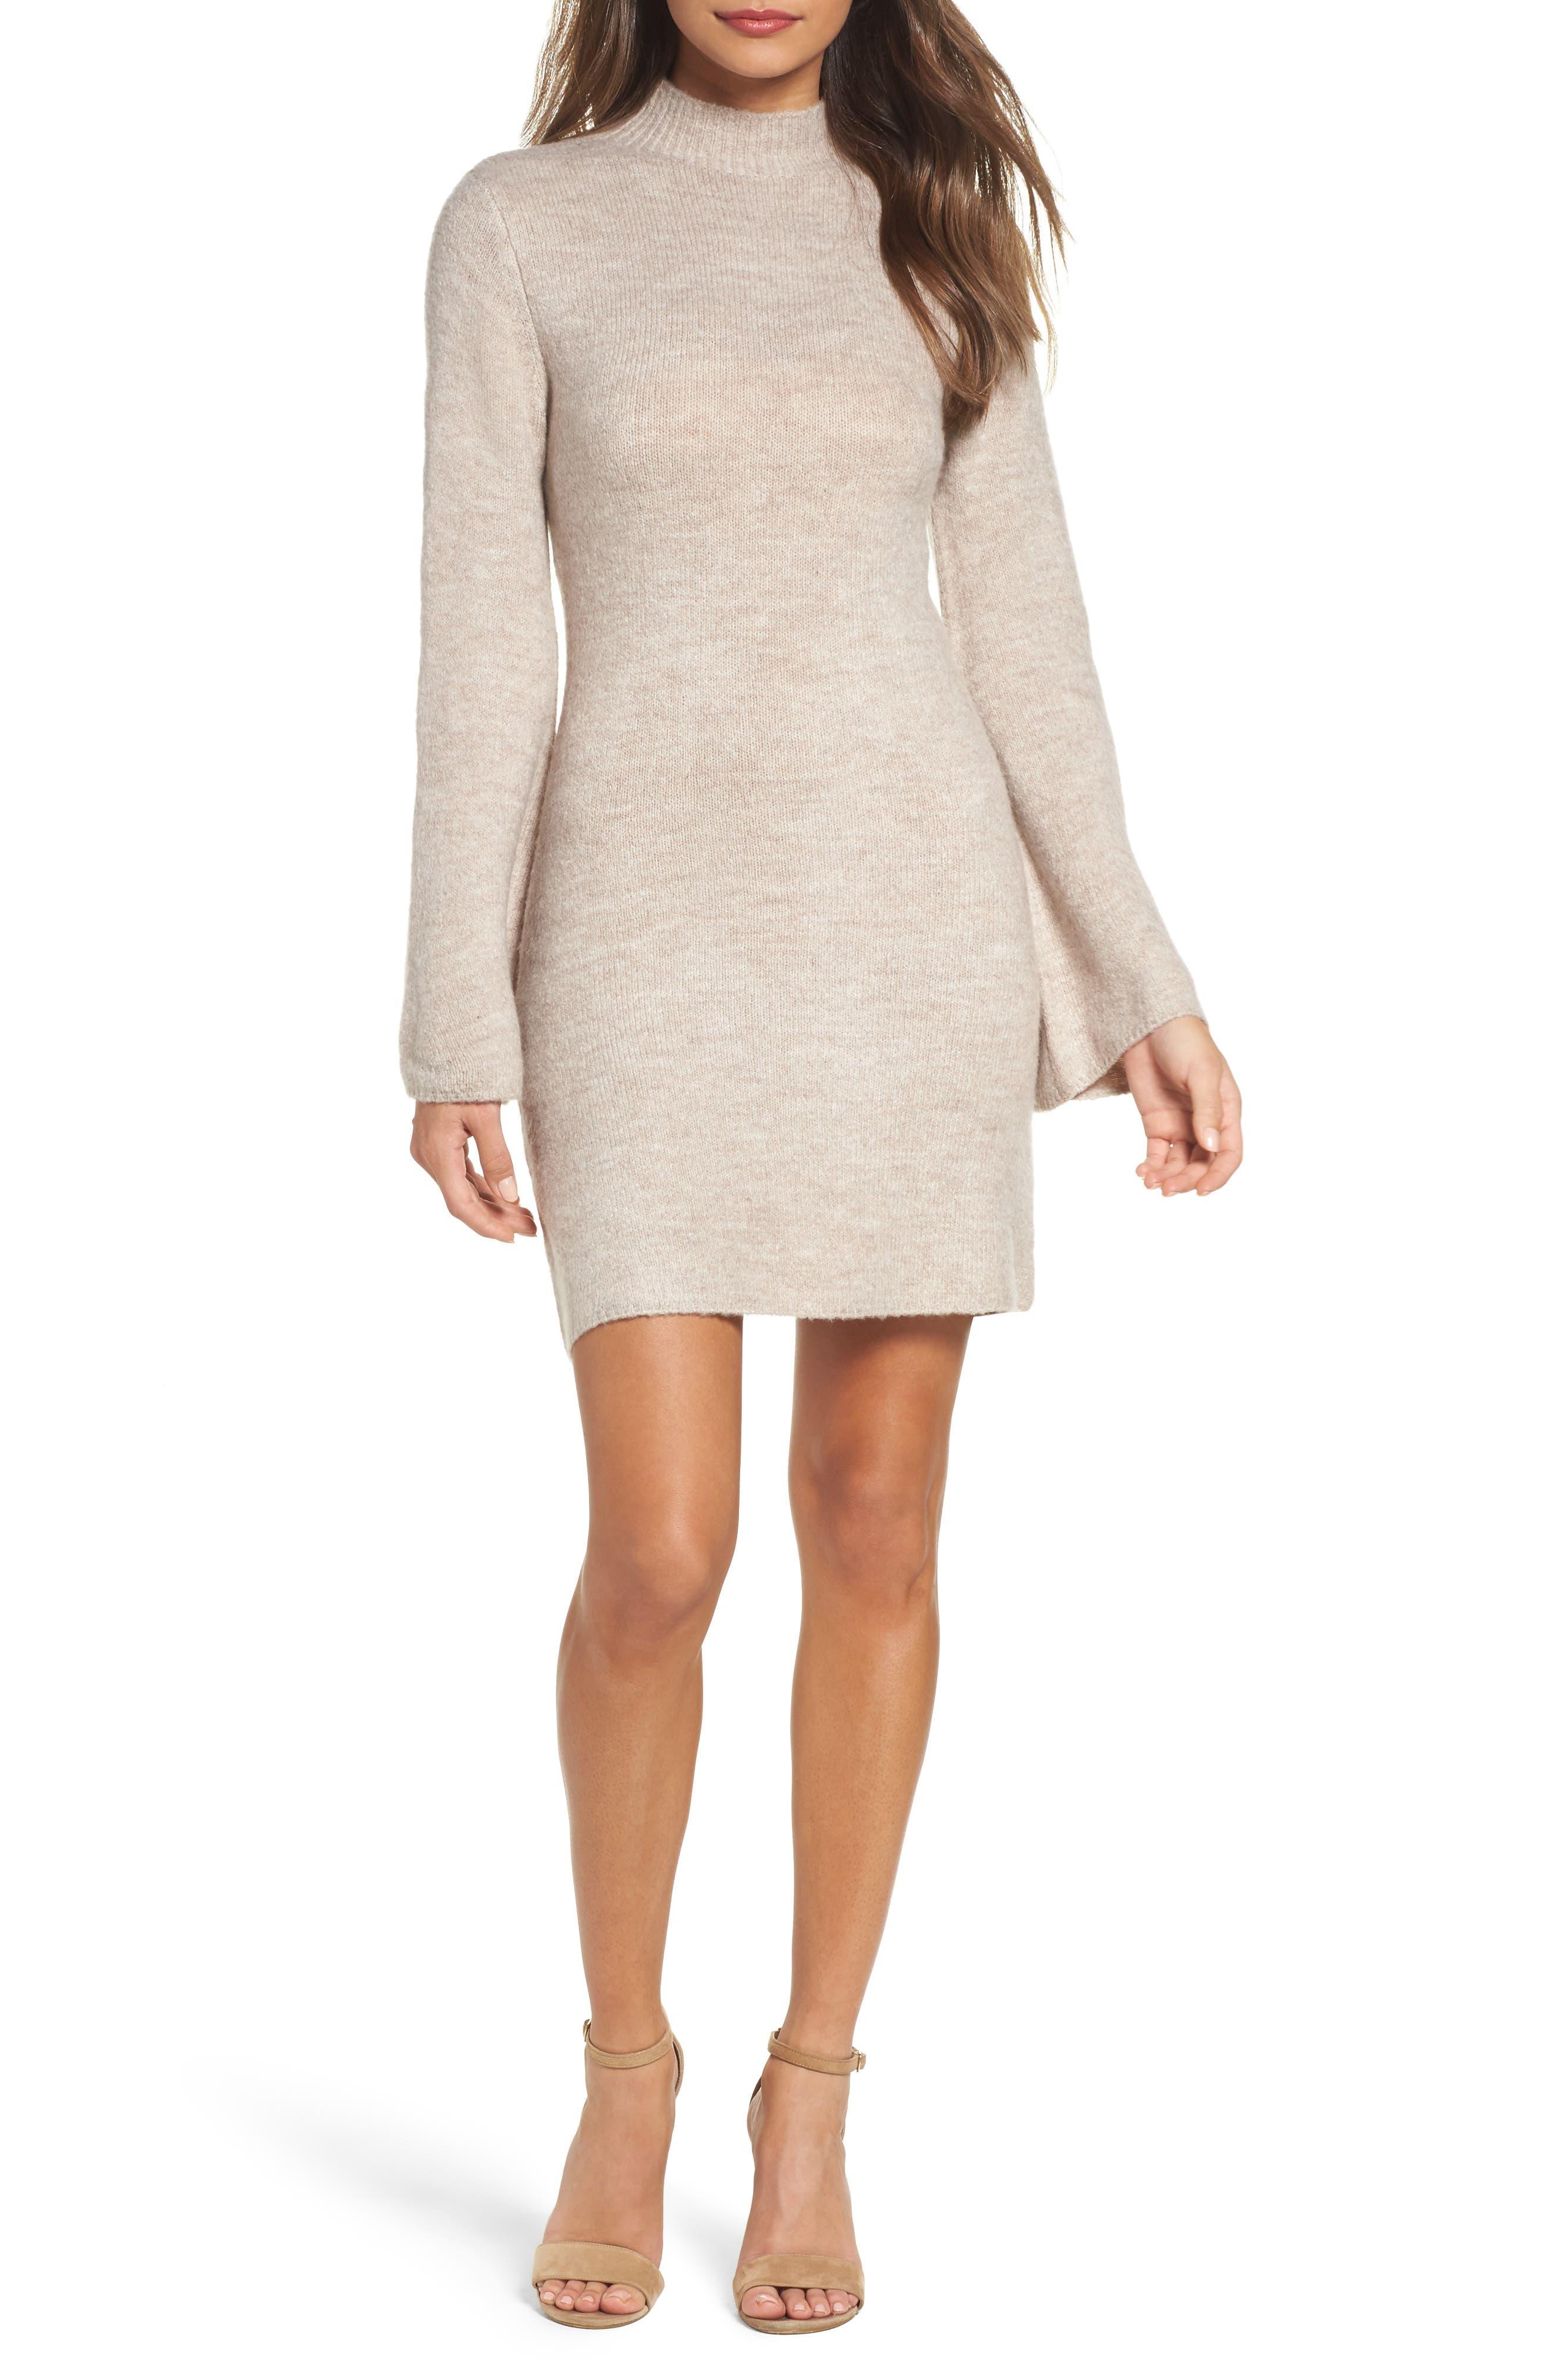 Alternate Image 1 Selected - Bardot Bell Sleeve Knit Dress